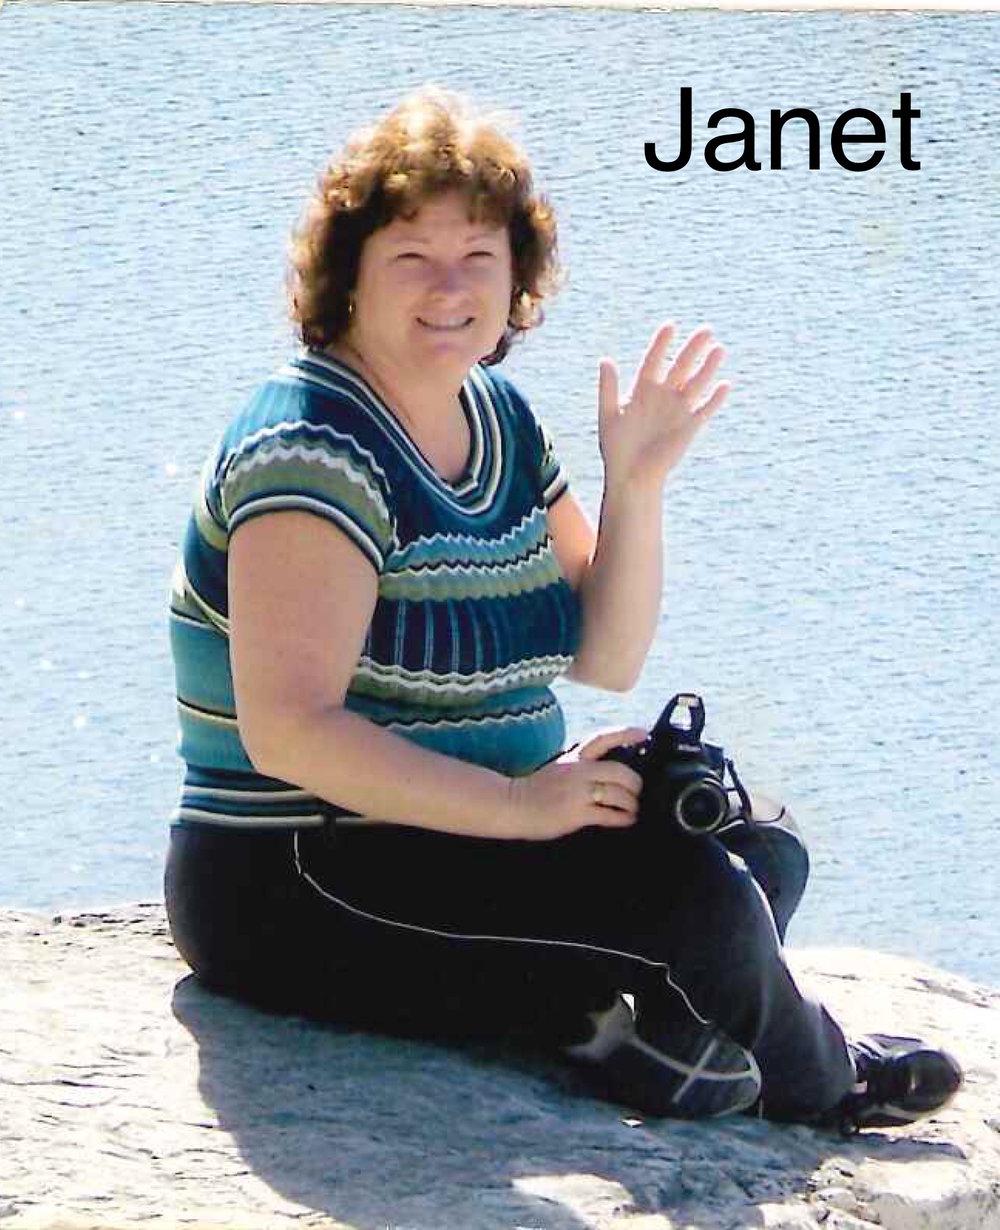 Janet_then_jpg.jpg